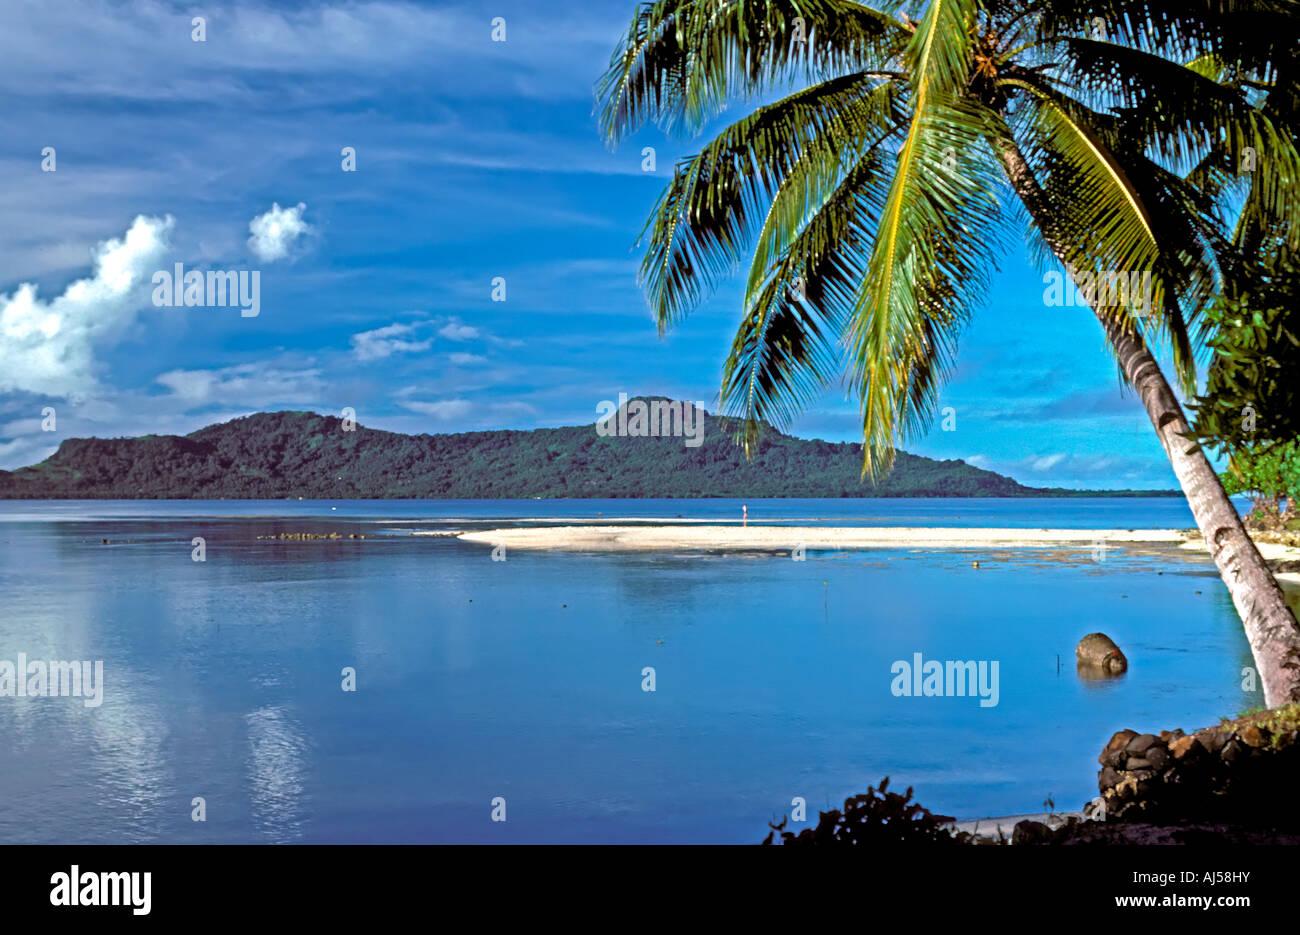 Truk lagoon beach offshore island palm tree chuuk islands federated islands of micronesia south pacific beach